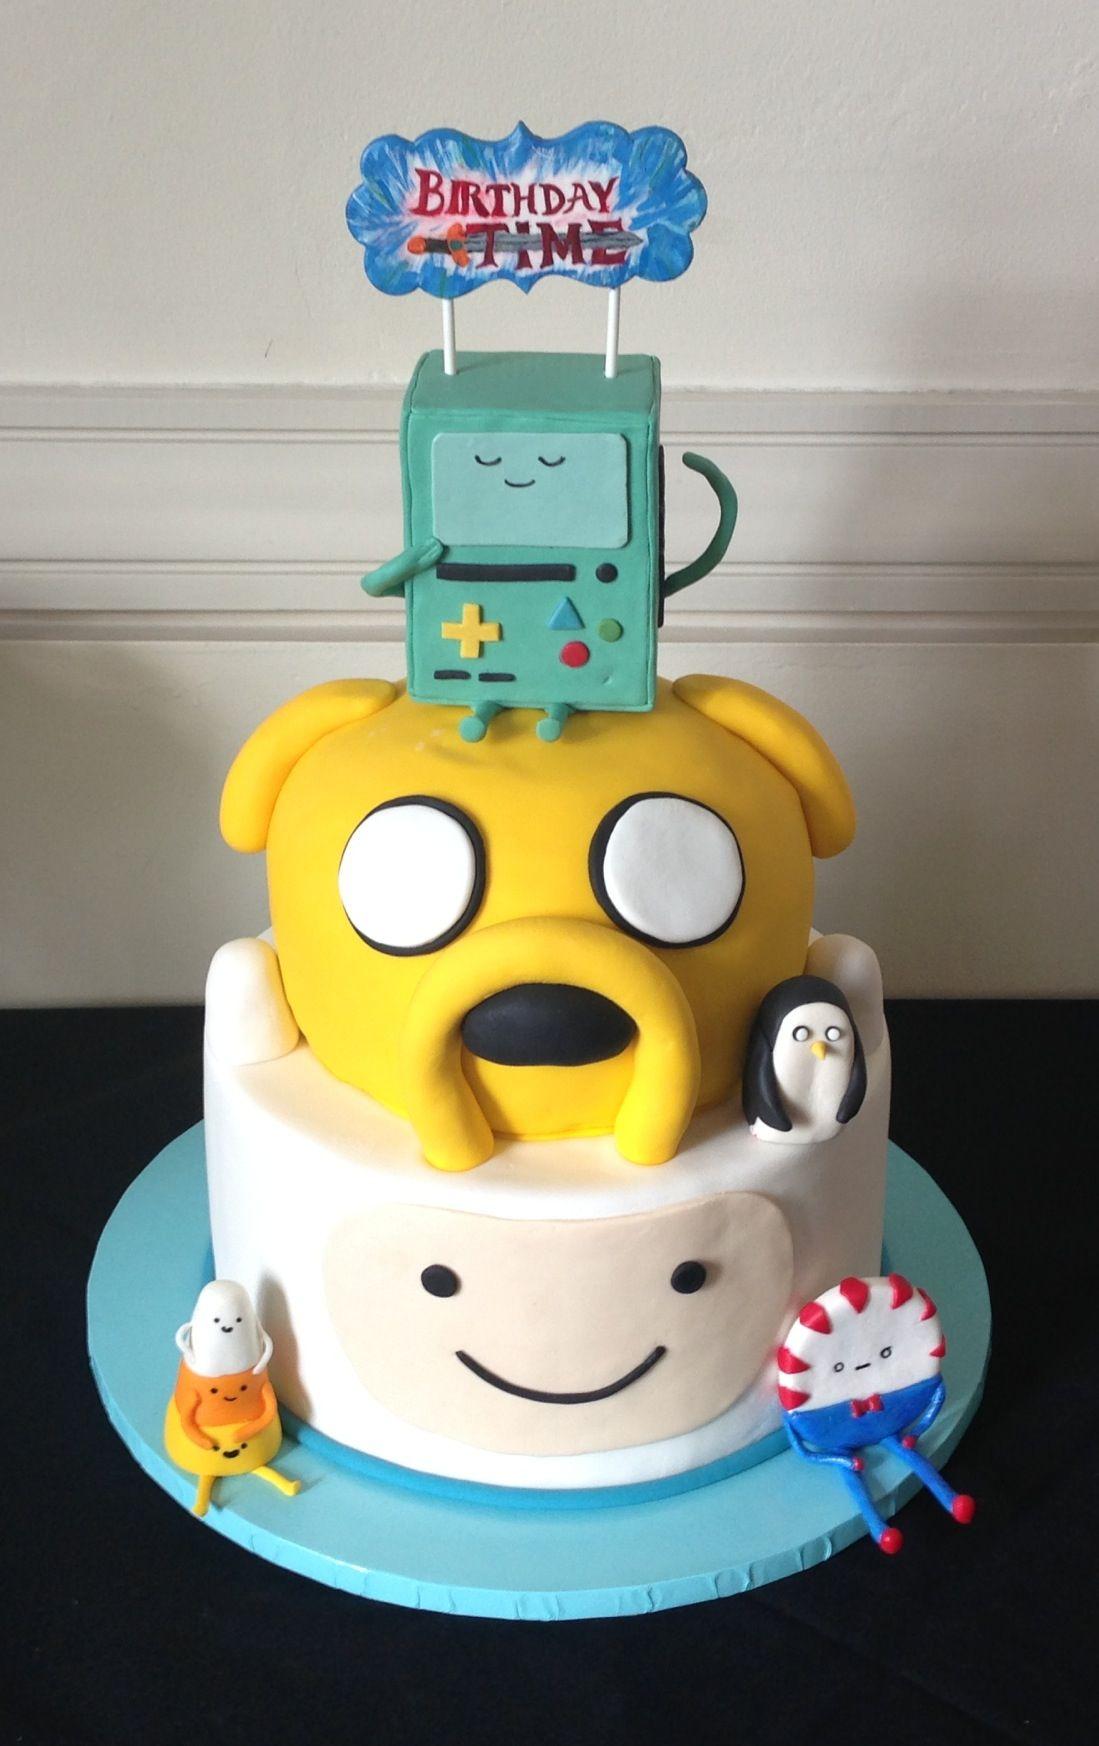 Finn And Jake Cake 2 0 Peppermint Butler Cake Candy Corn Cake